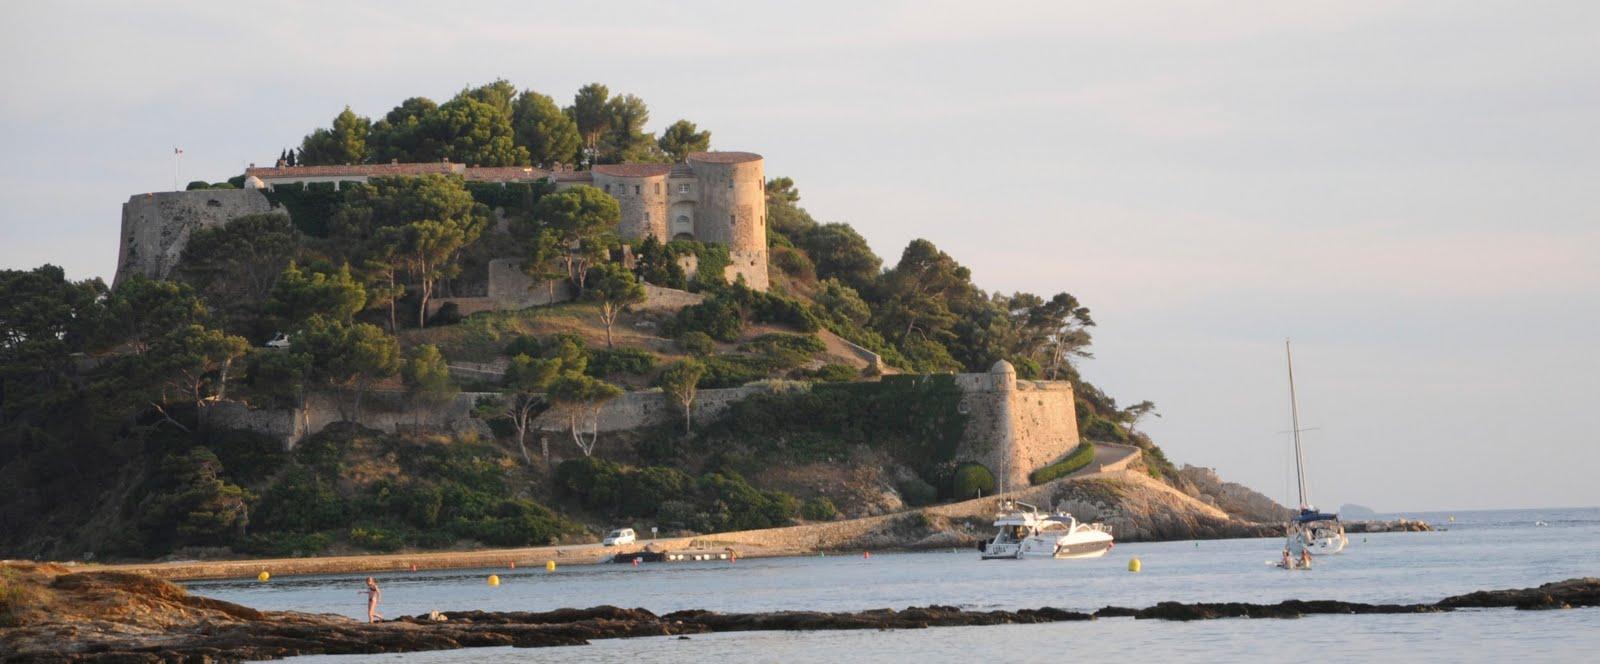 Fort de Brégançon, Sarkozy's summer residence